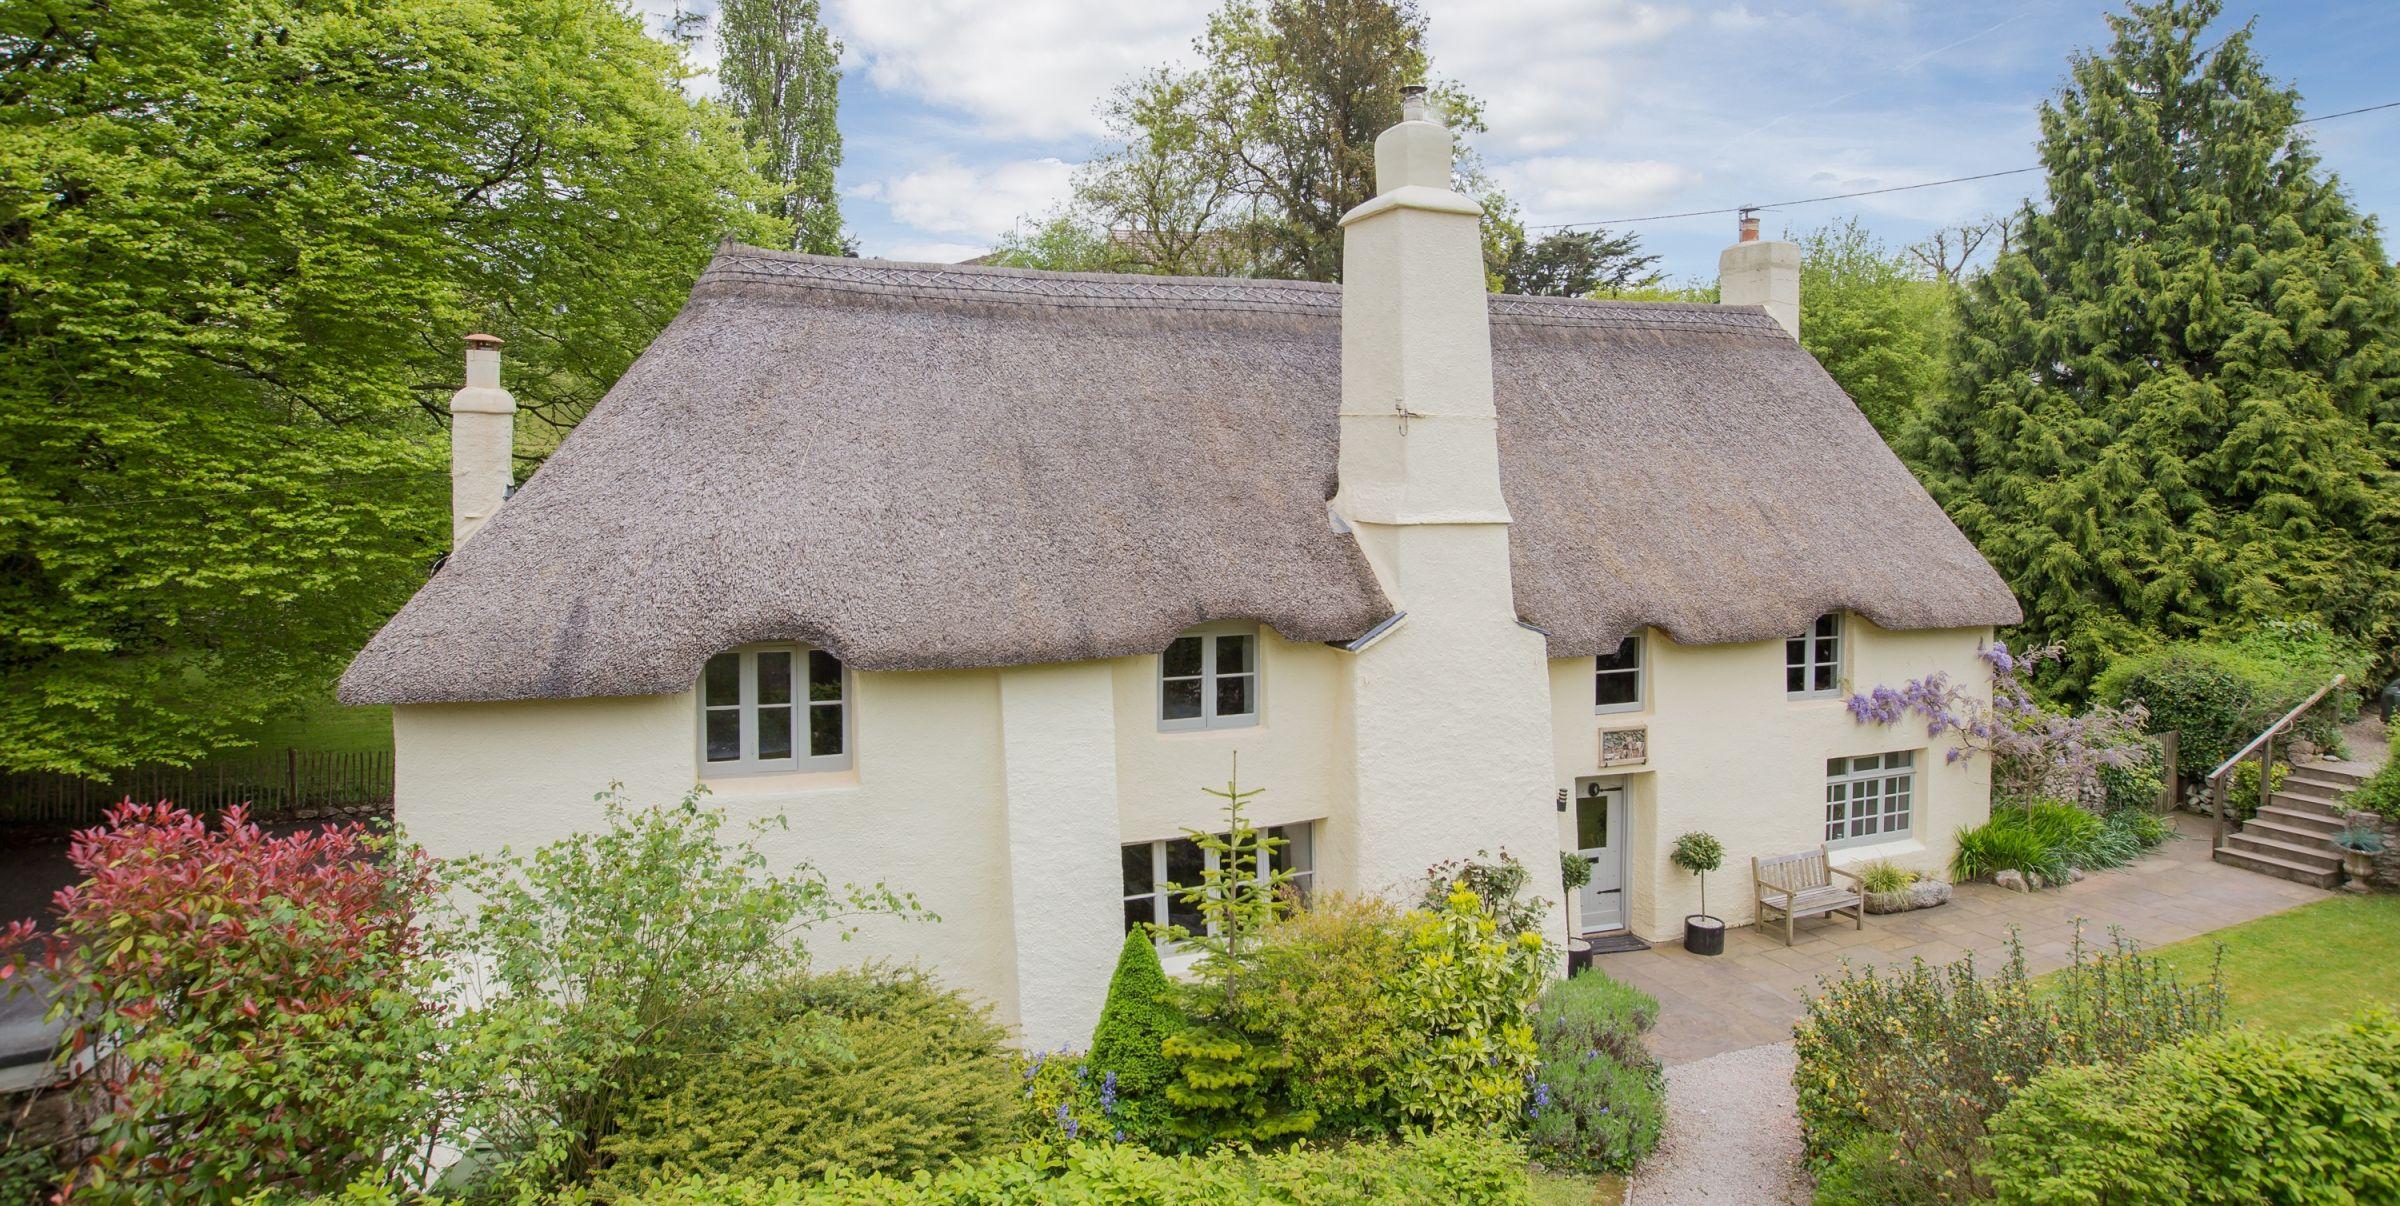 Pitt House, Kingskerswell, Newton Abbot, Devon - Main Exterior - Marchand Petit